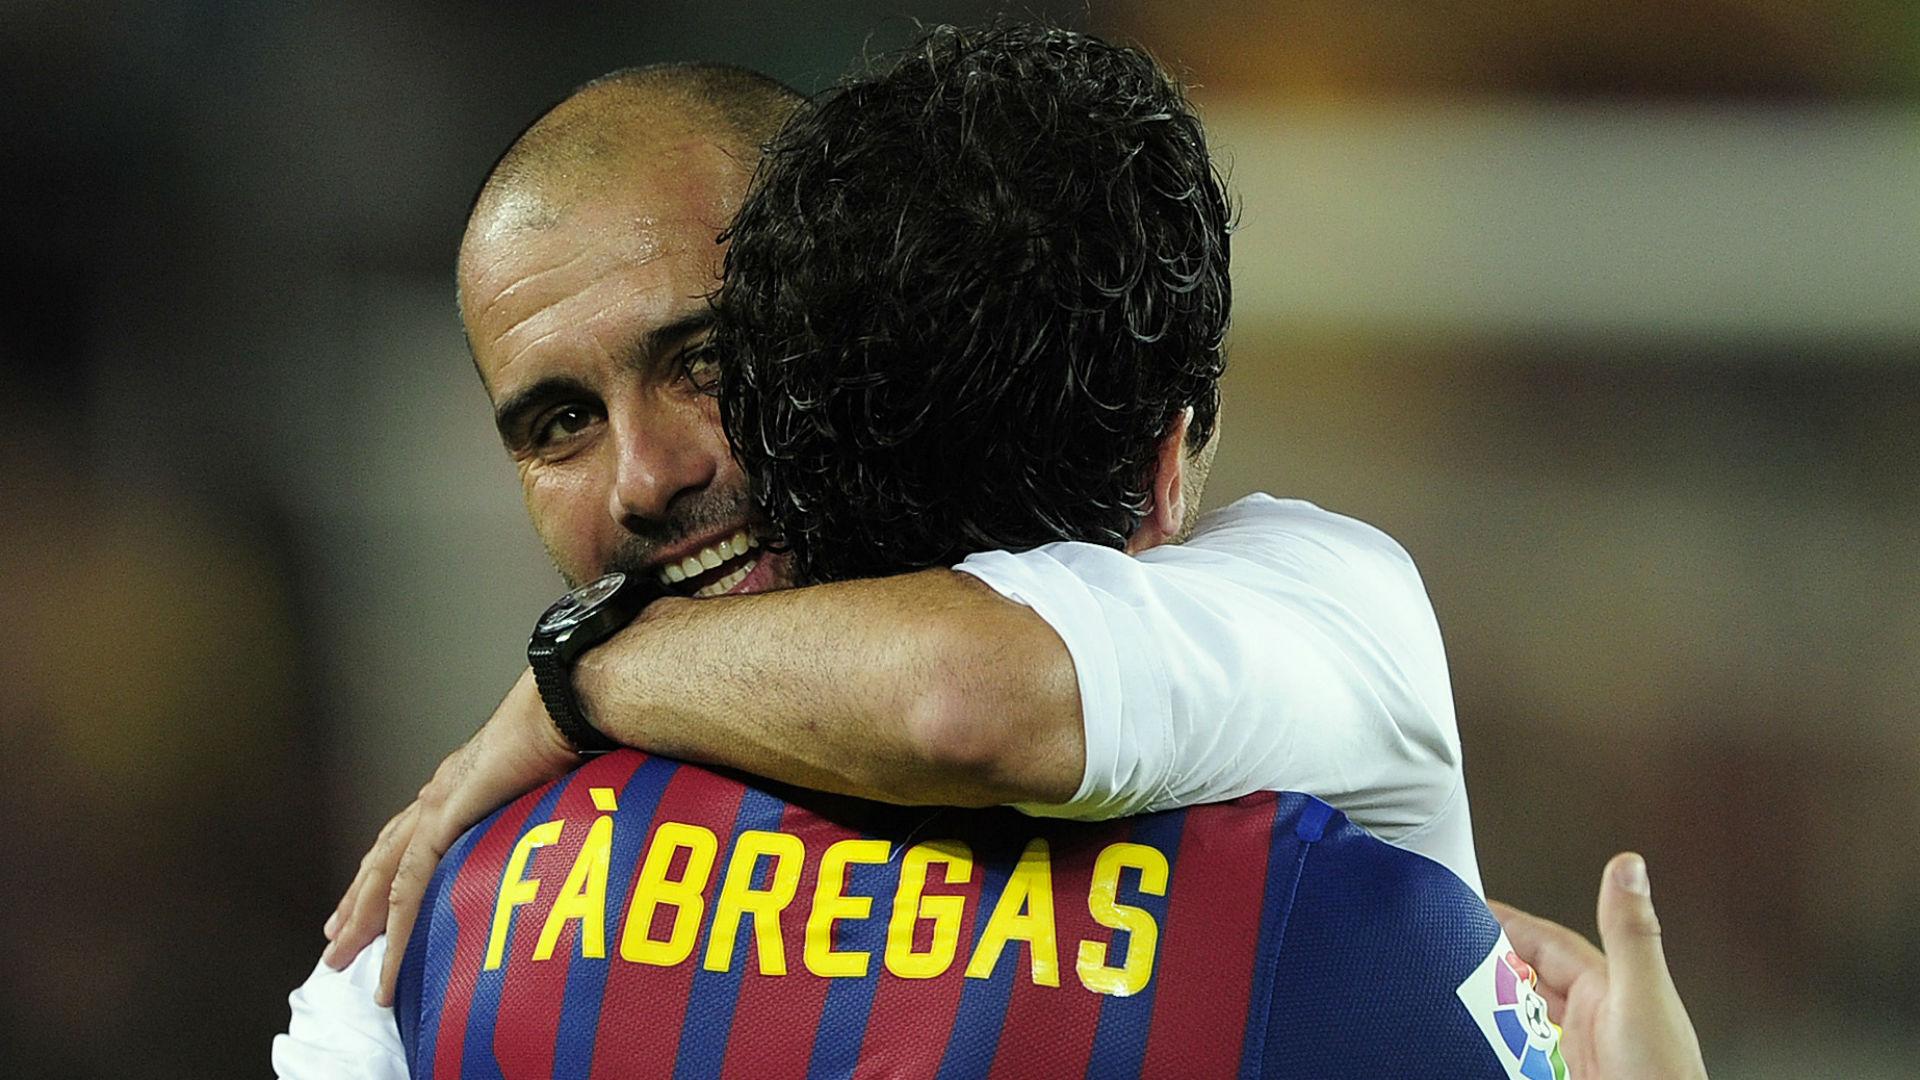 Fabregas e Guardiola